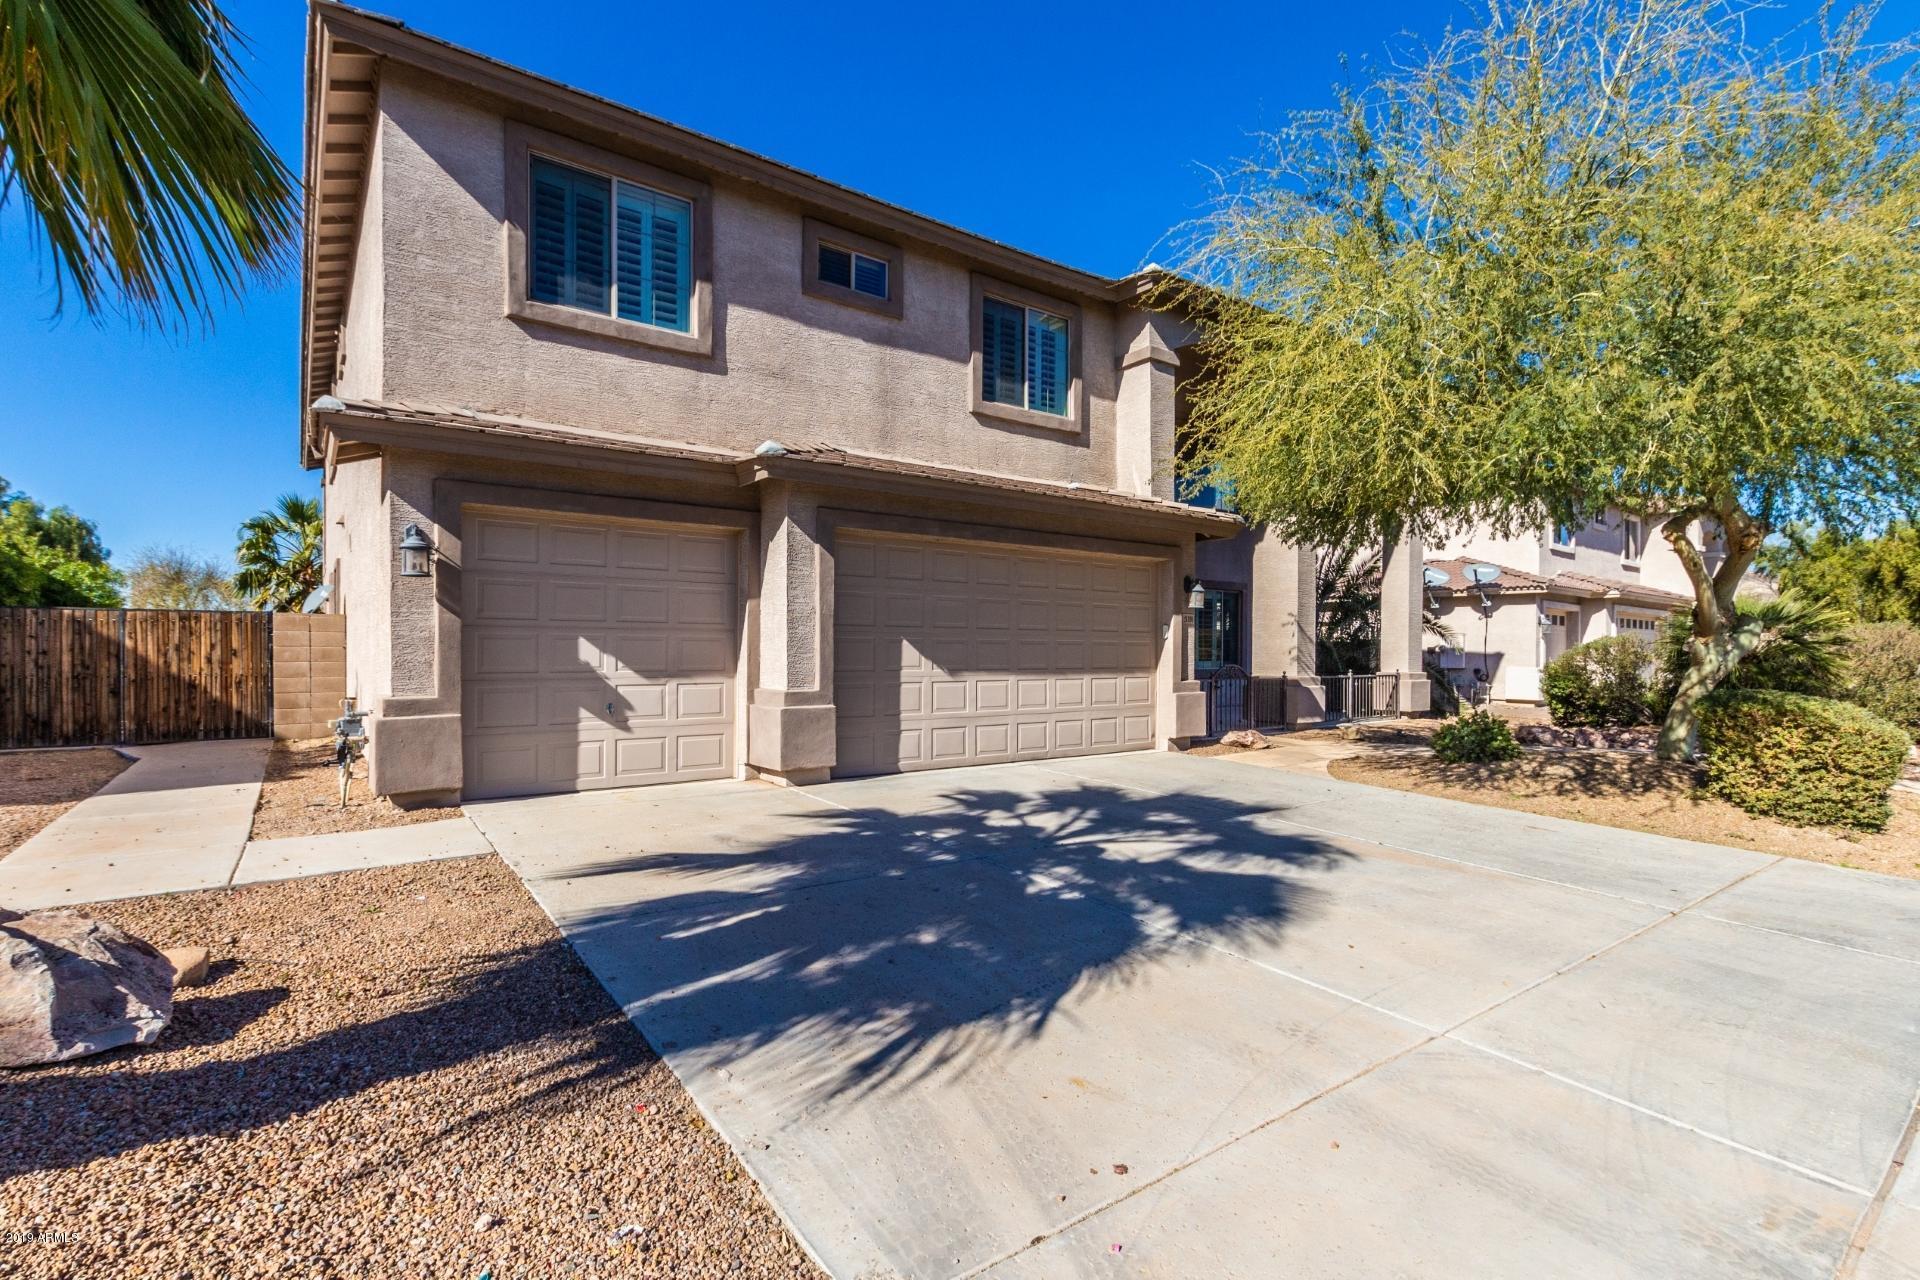 MLS 6019798 21894 N BALBOA Drive, Maricopa, AZ 85138 Maricopa Homes for Rent